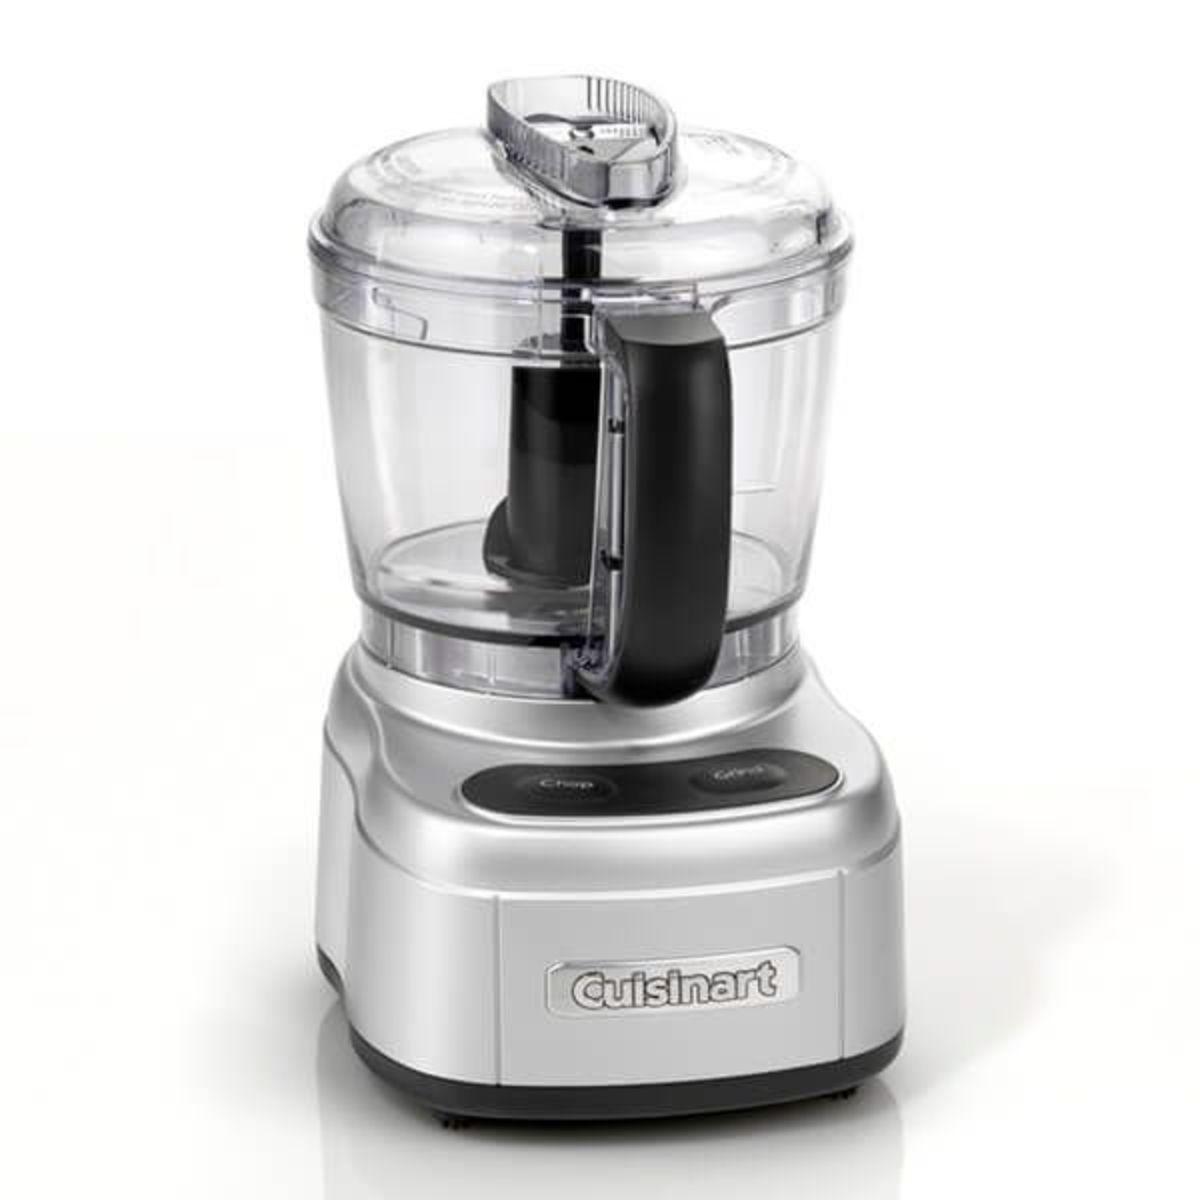 Image of Cuisinart ECH4U Mini Prep Pro